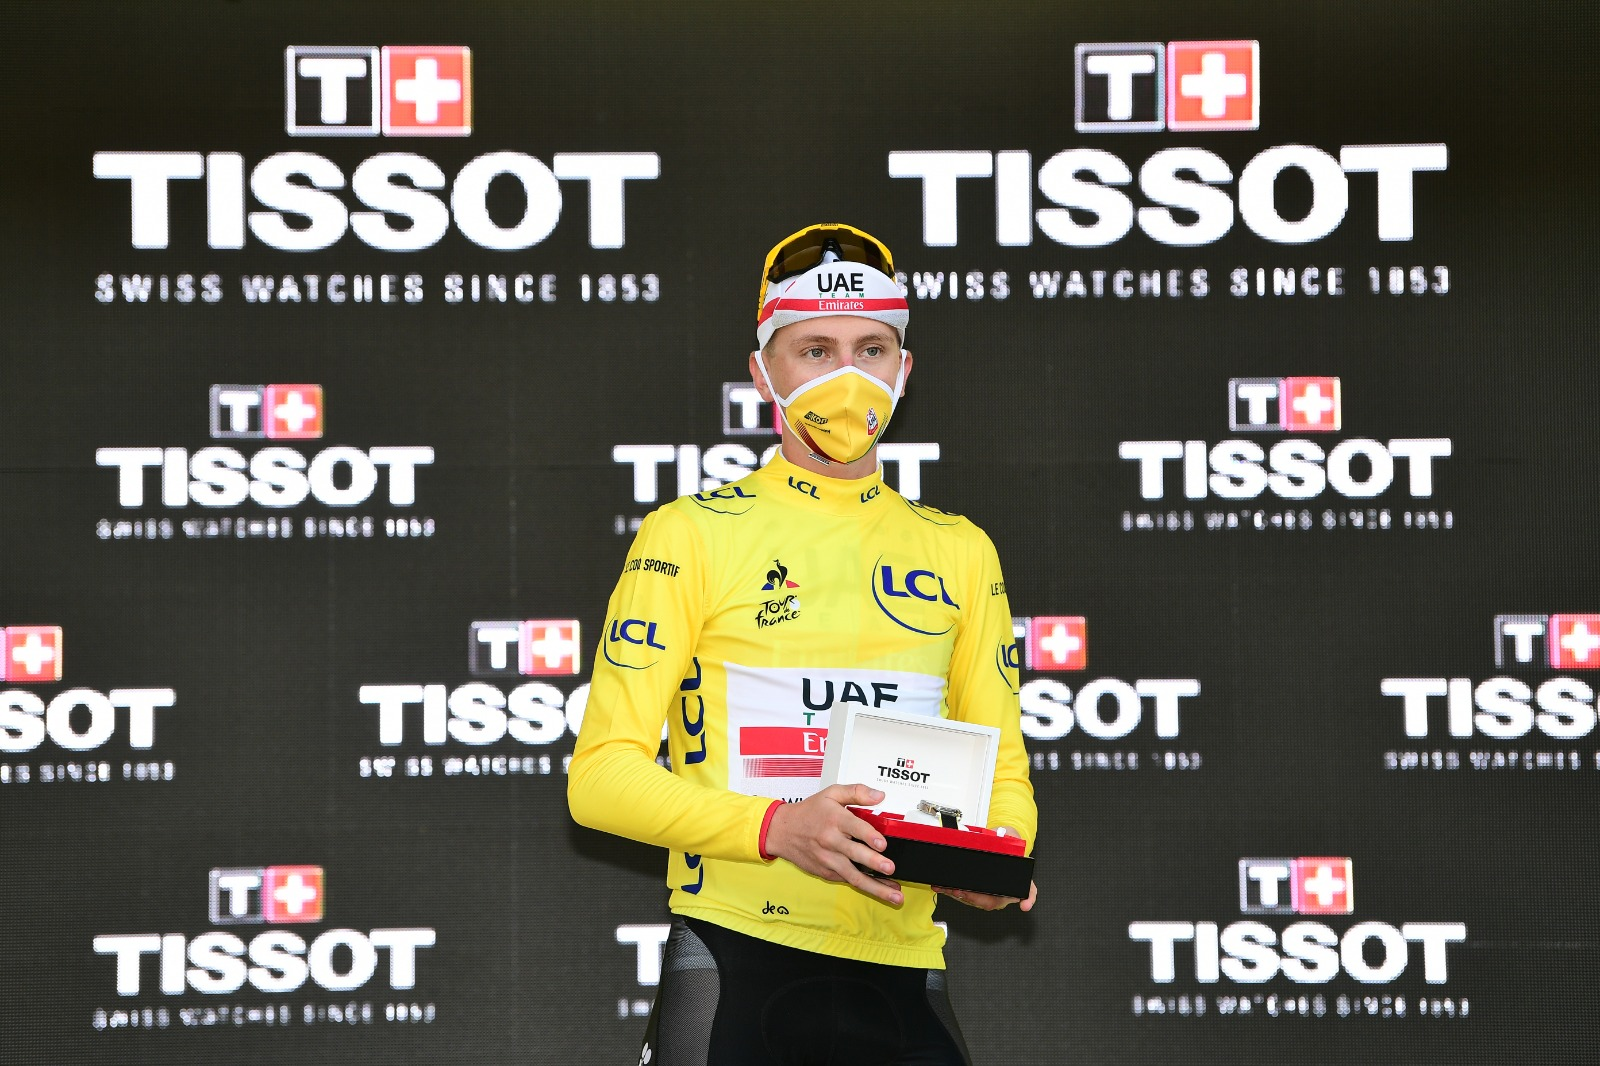 Gesto roglic Pogacar Tour de Francia 2020 ph Tw Tour de Francia col